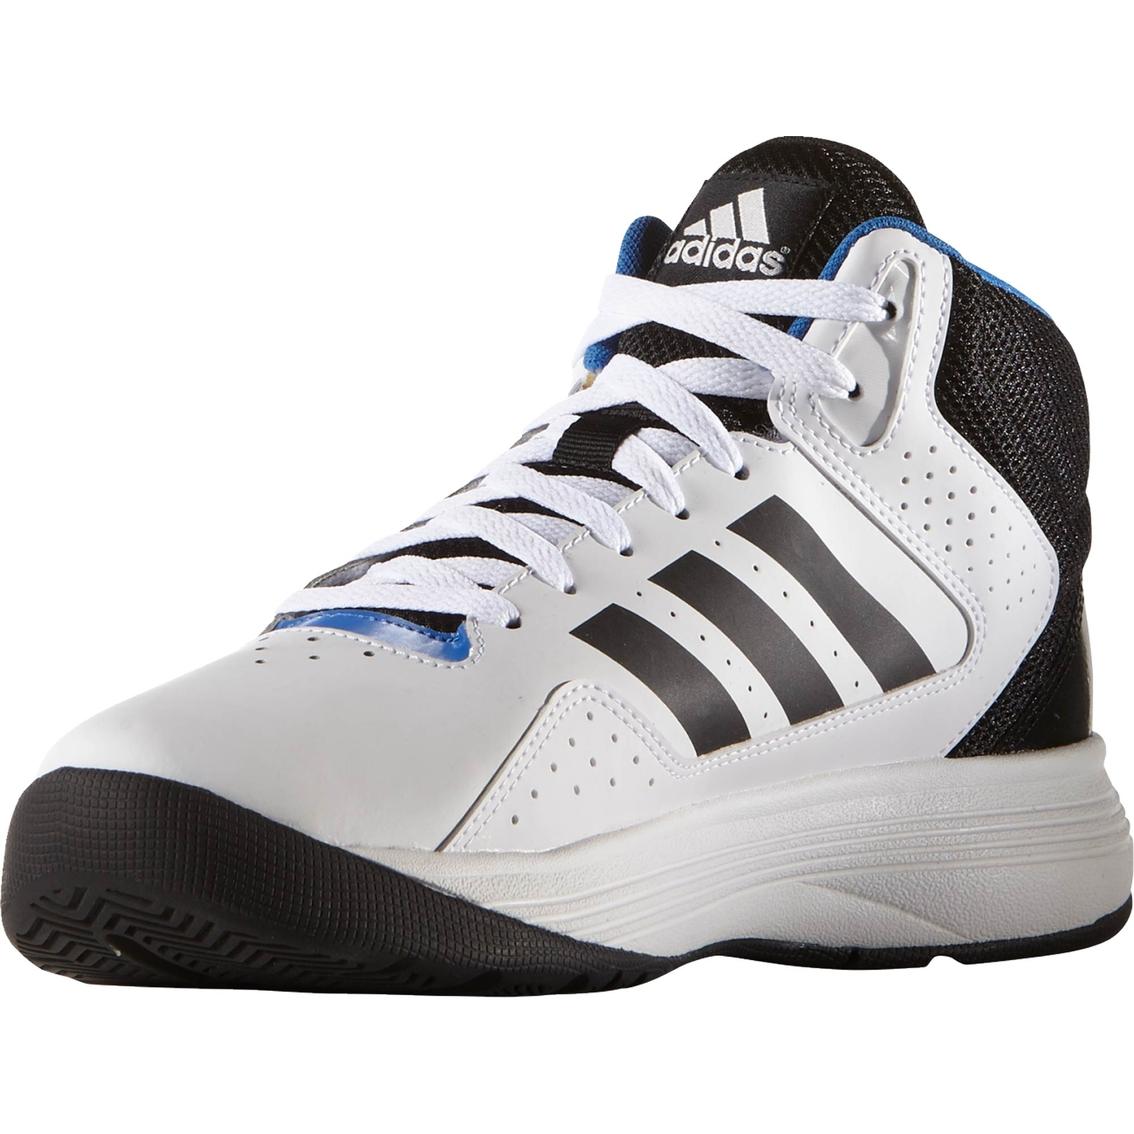 77bb881cad9 Adidas Men s Cloudfoam Ilation Basketball Shoes